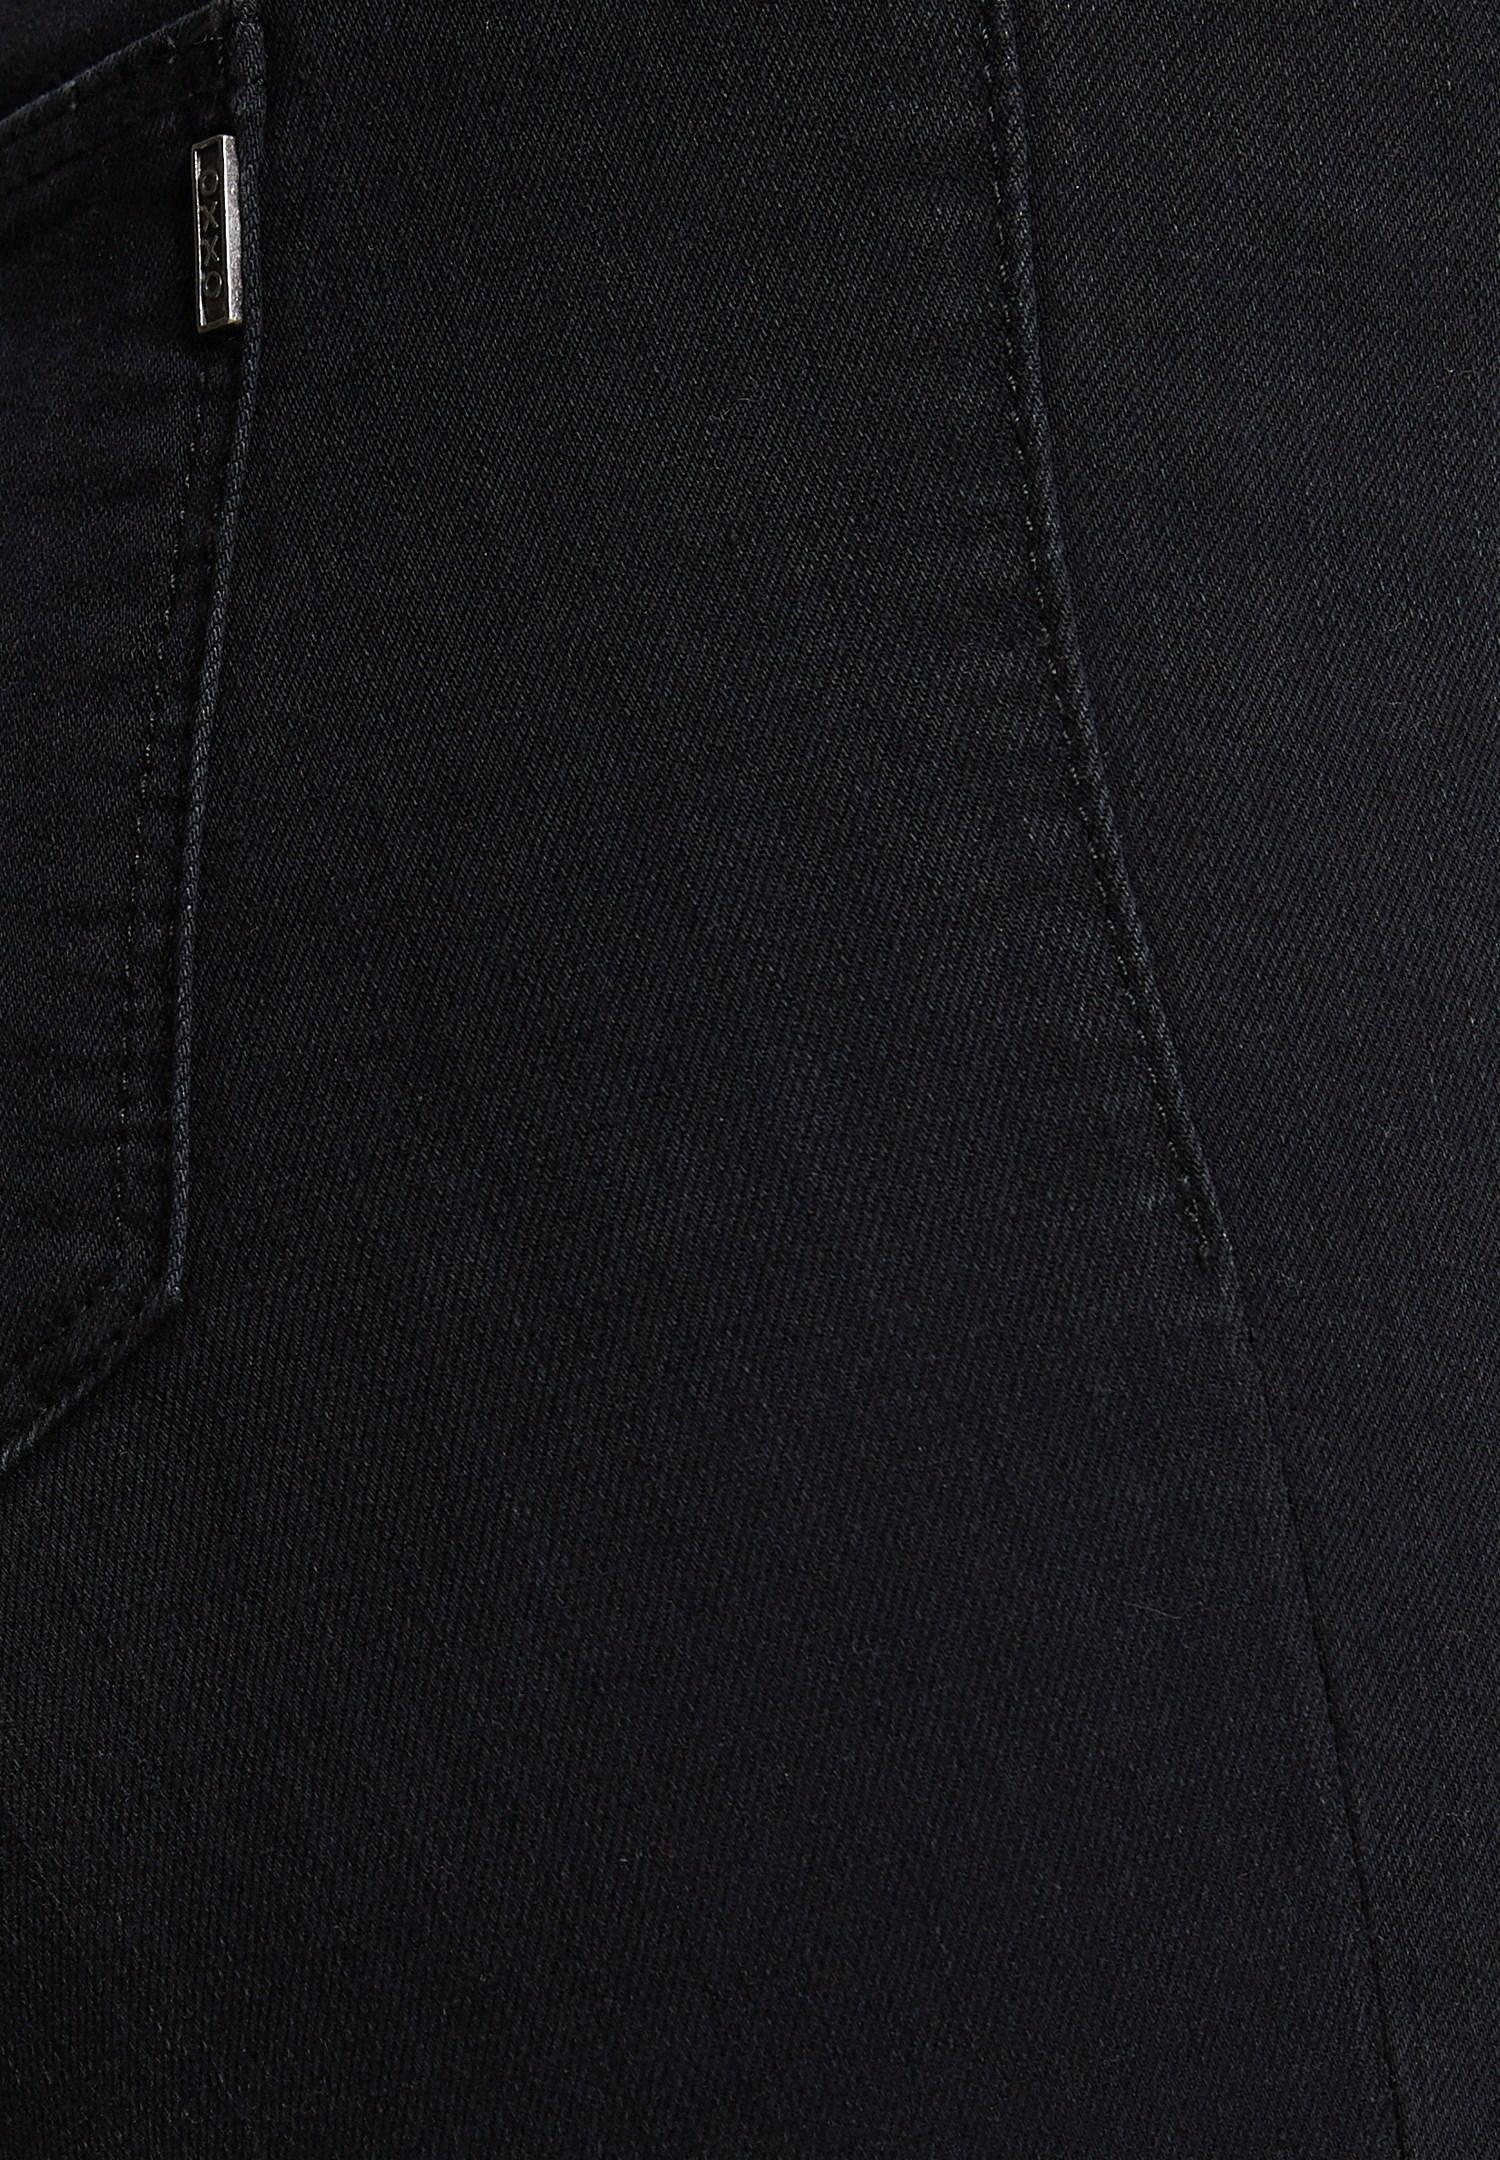 Women Black High Waist Denim Pants with Cuff Details